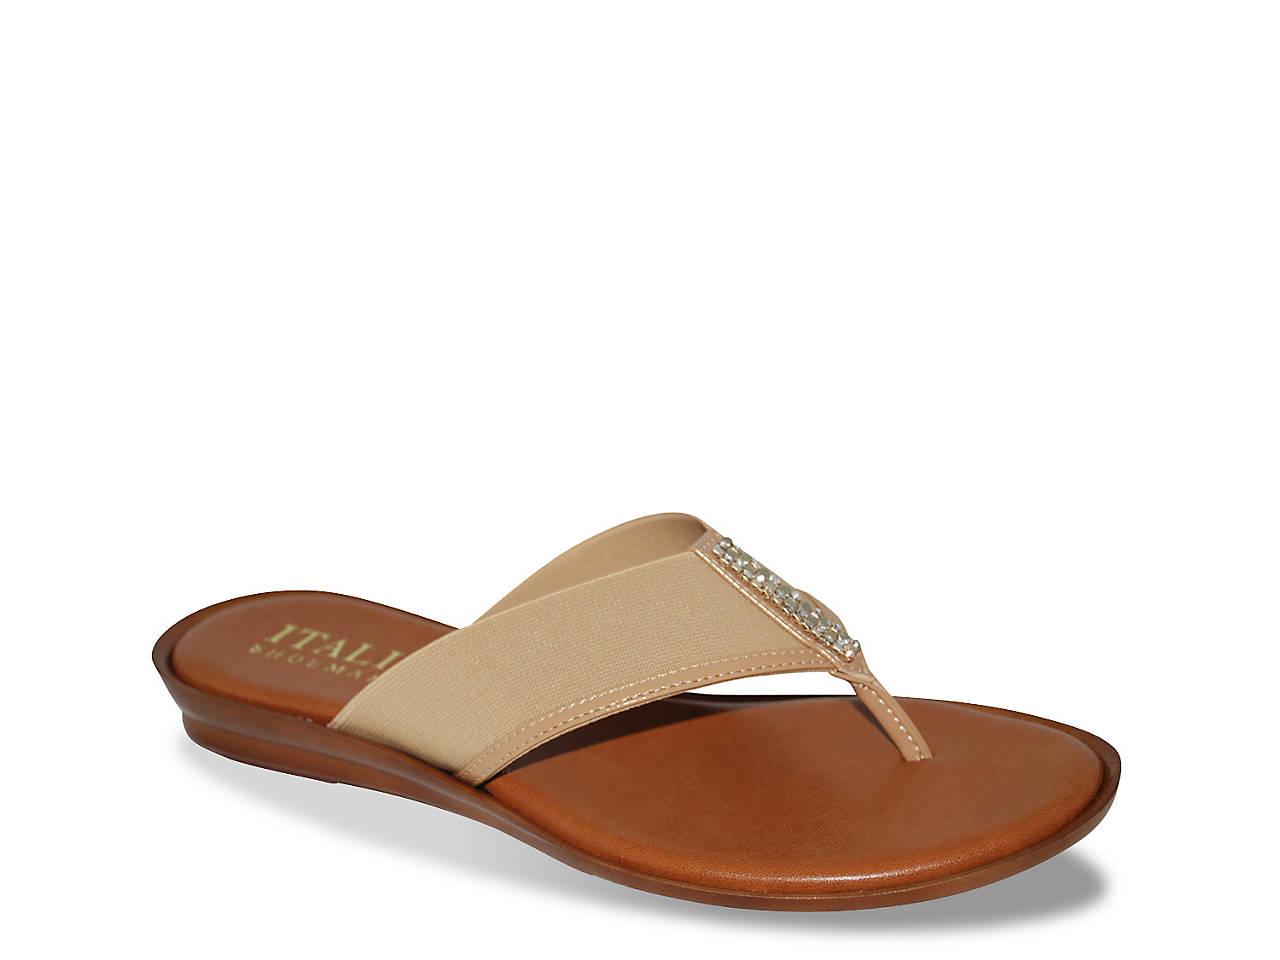 7a32a0031b Italian Shoemakers Jewel Wedge Sandal Women's Shoes | DSW